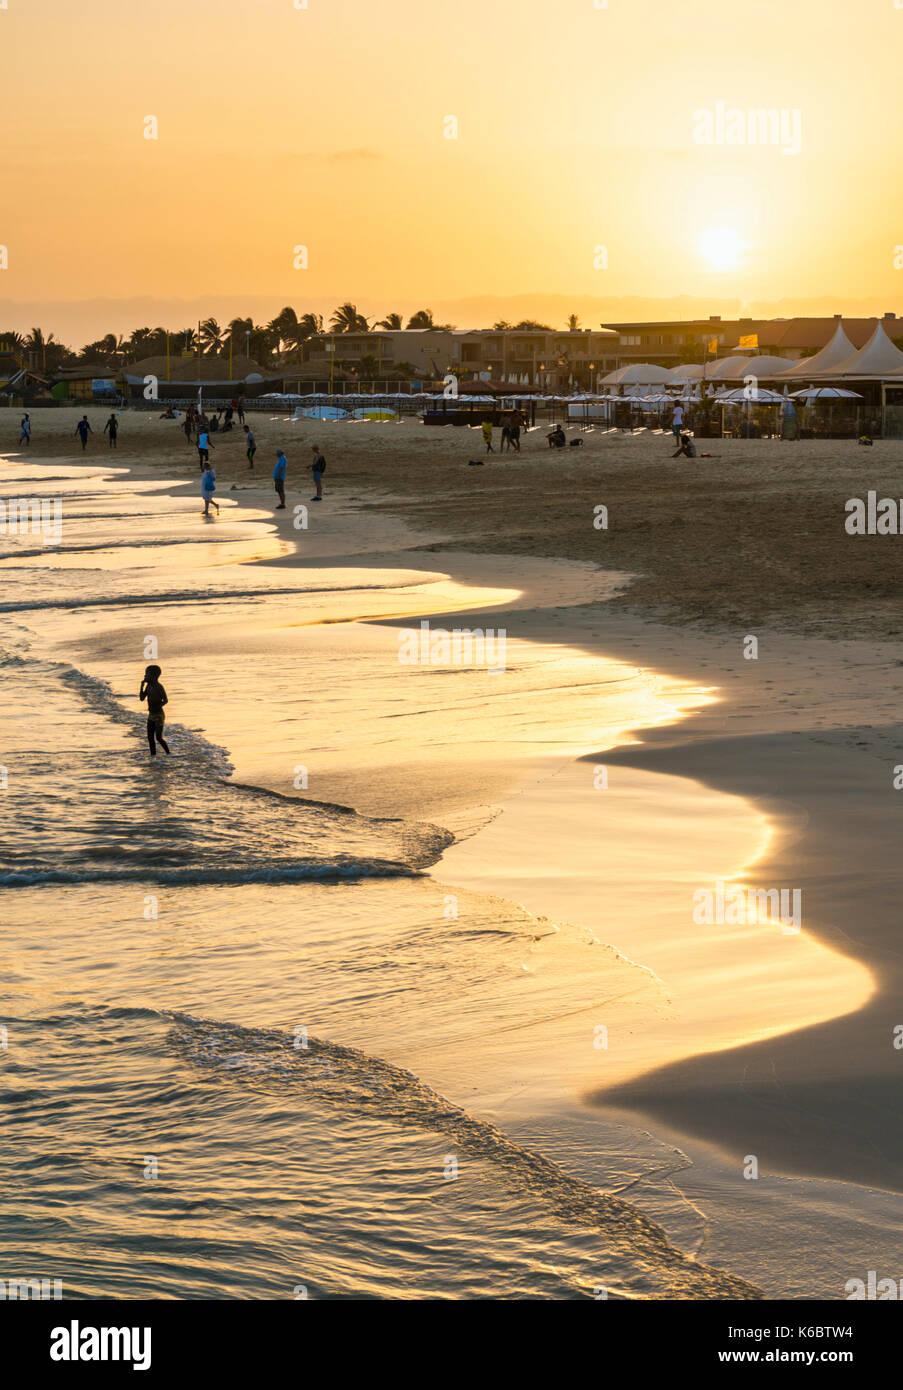 CAPE VERDE SAL Sunset at the beach in Santa Maria, Praia de Santa Maria, Baia de Santa Maria, Sal Island, Cape Verde, Stock Photo